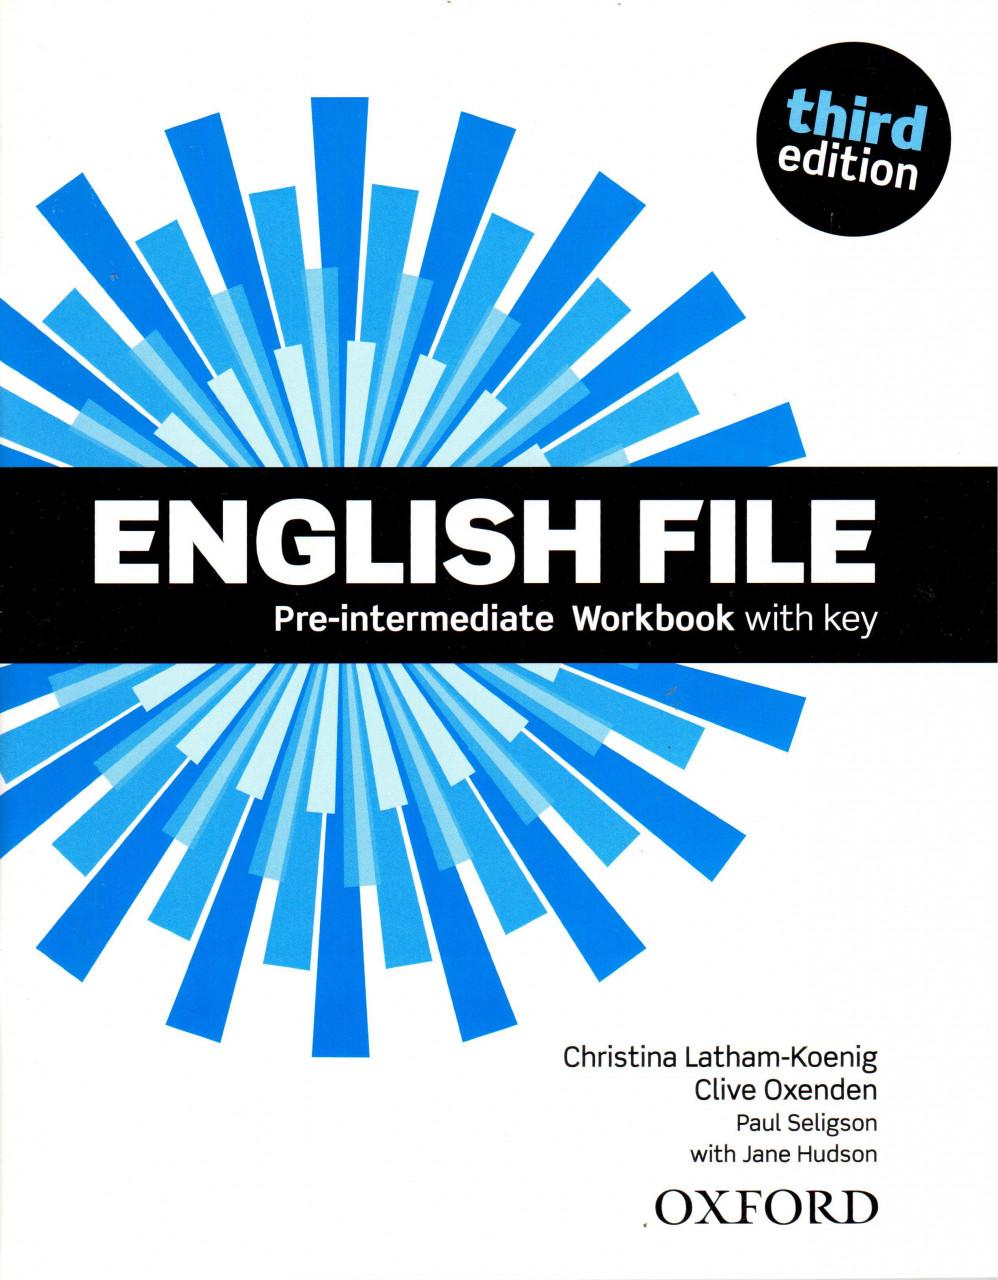 English File: Pre-intermediate Workbook with key (3rd edition)